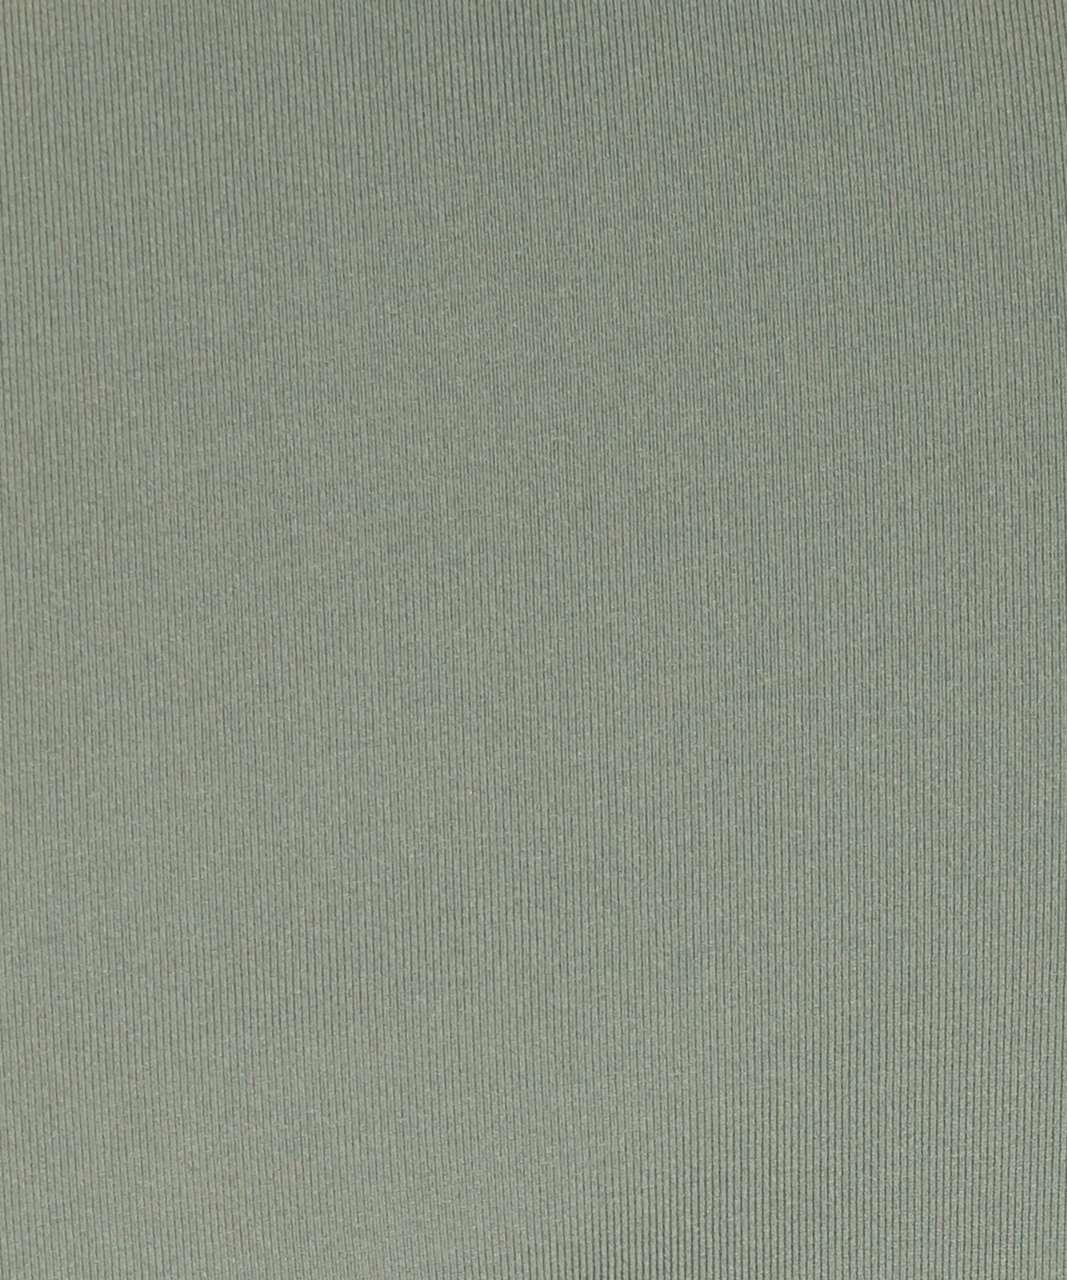 Lululemon Energy Bra *Medium Support, B-D Cup - Grey Sage